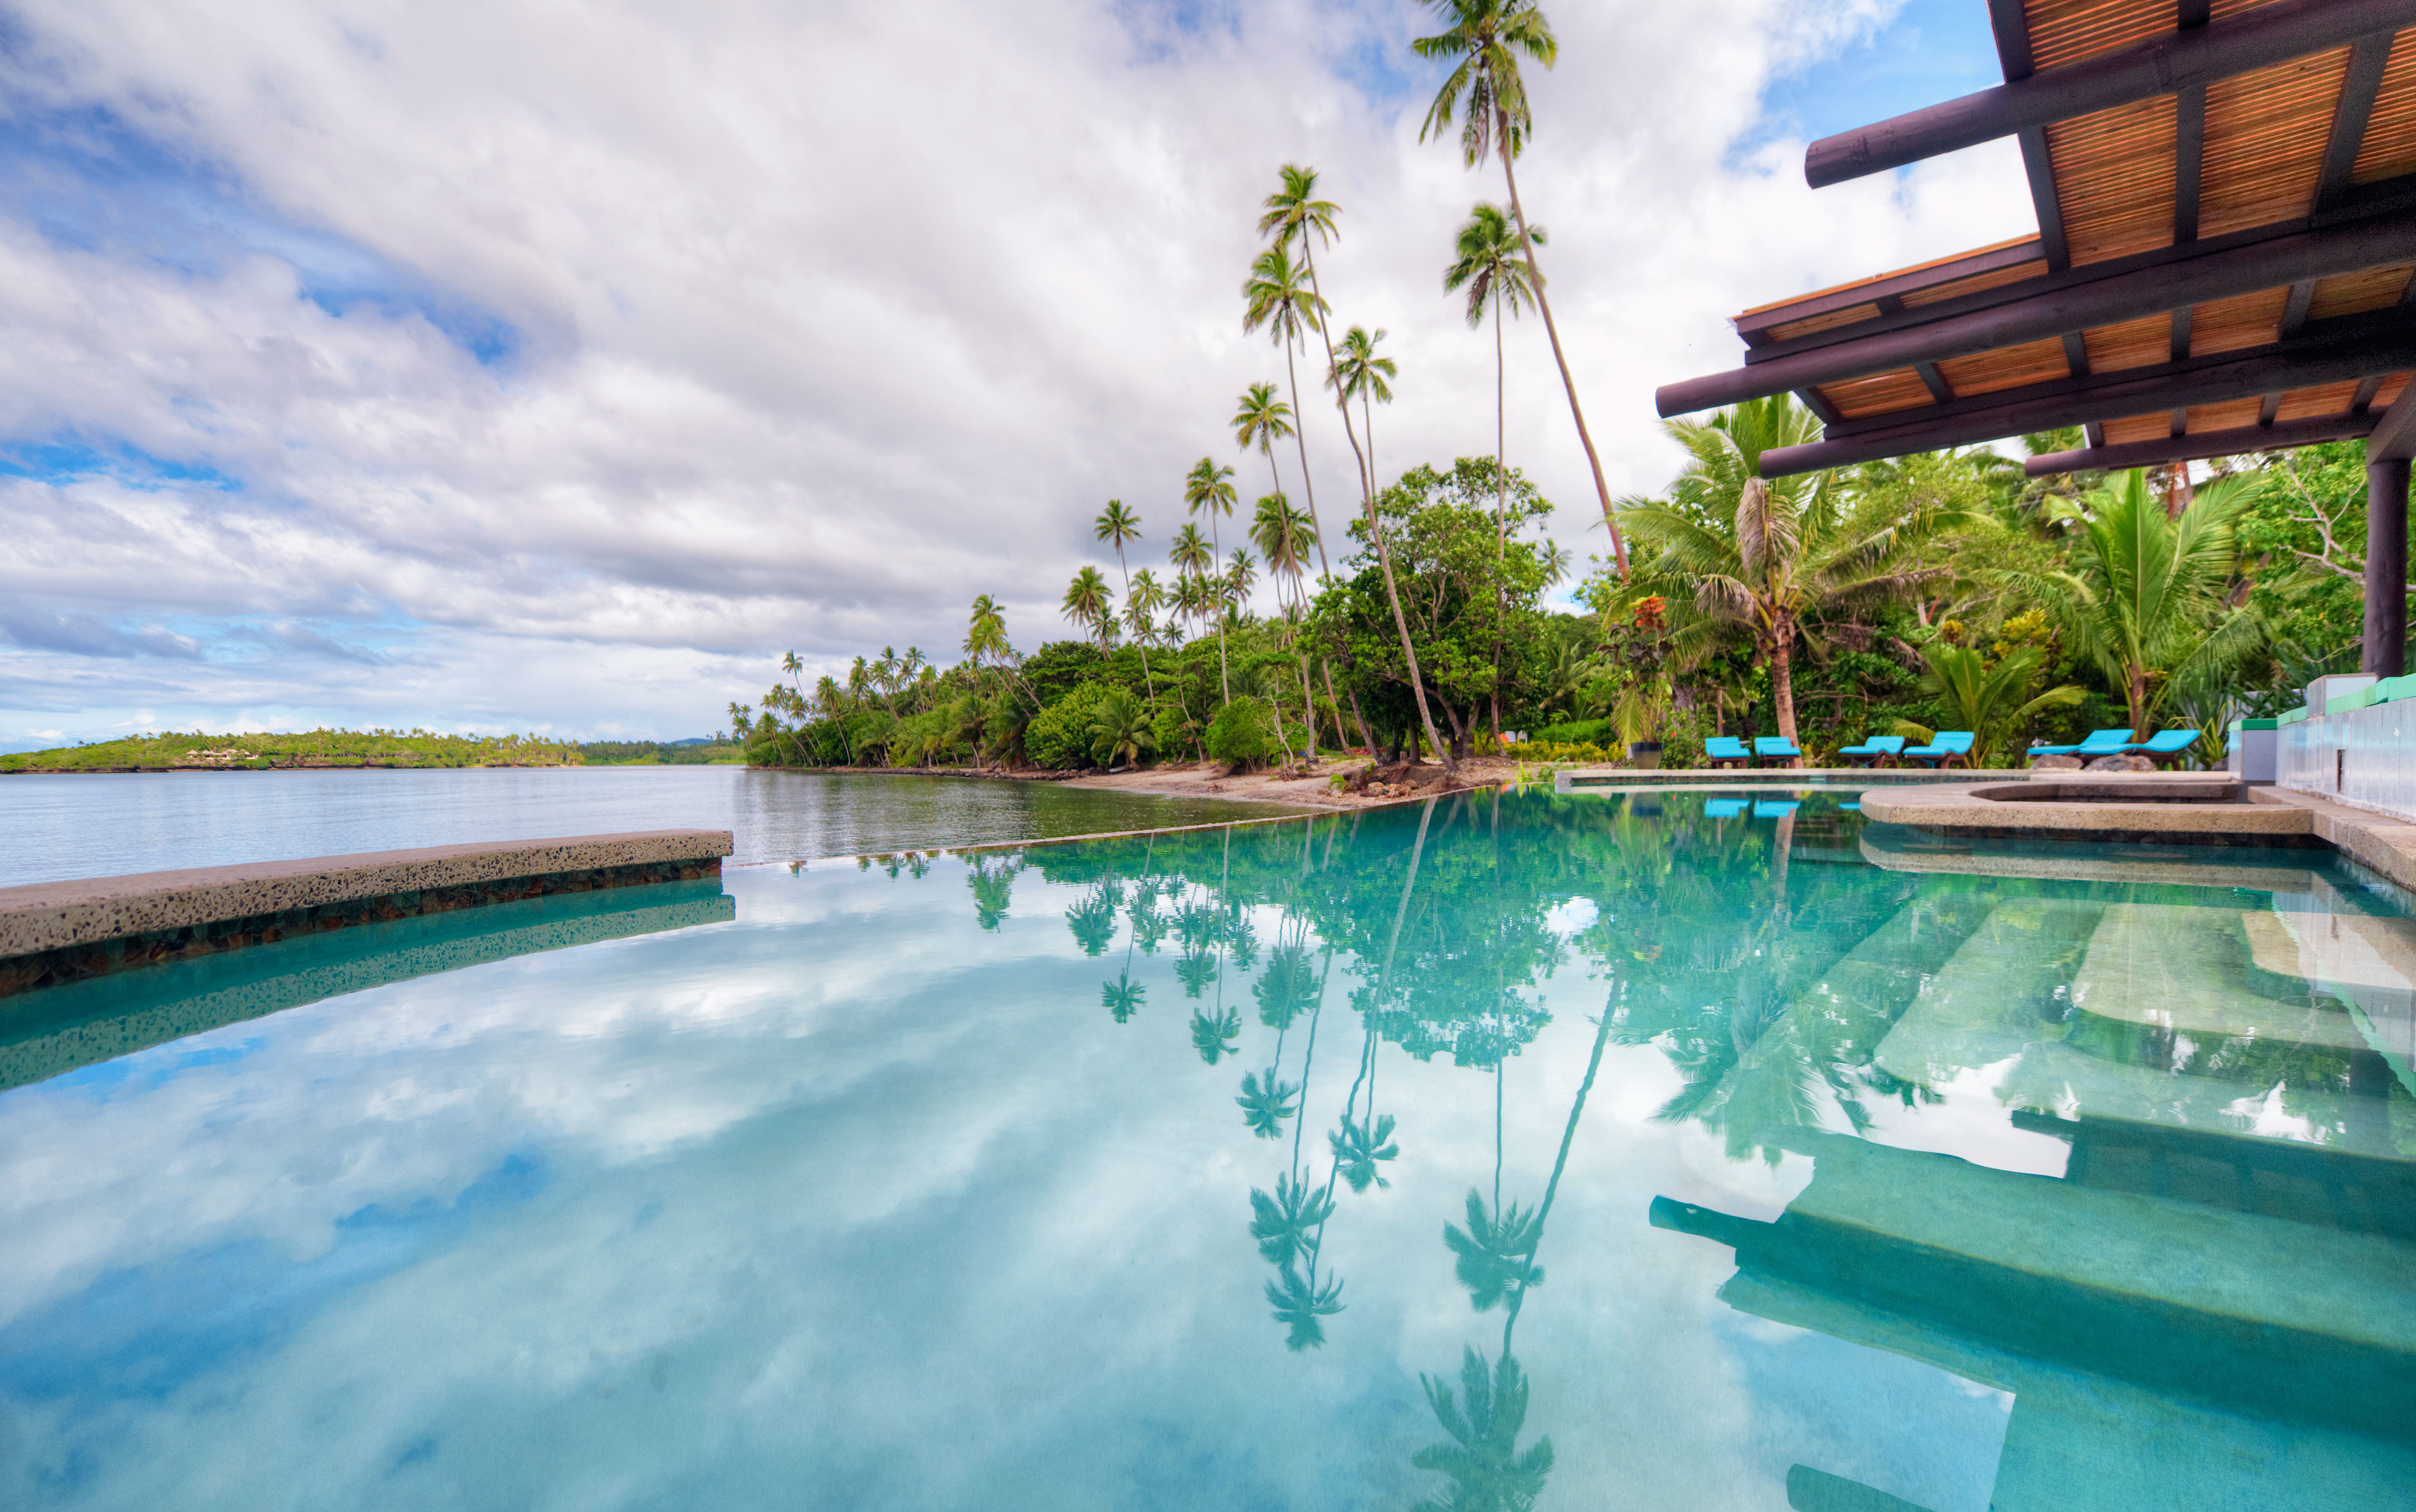 Modern Pool Scenic views Waterfront swimming pool water Resort Lagoon Sea